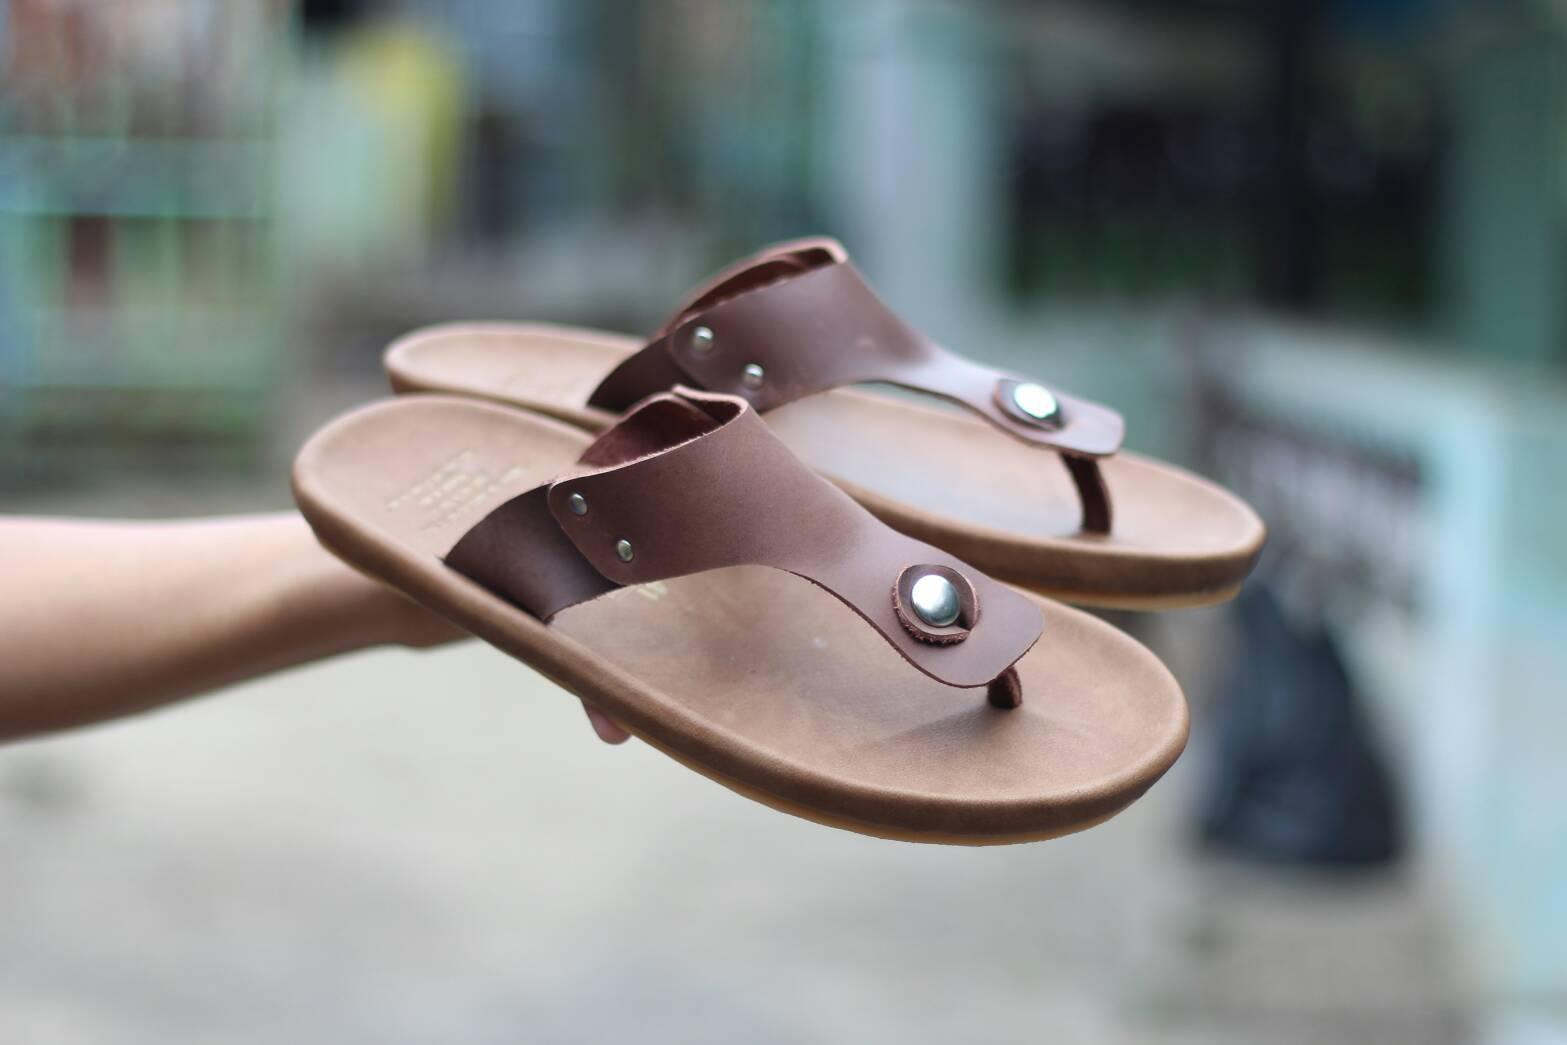 Sendal kulit termurah - goodness footwear - cevany footwear -sendal pria terlaris - sandal kulit asli  - sandal  distro - sandal terlaris di bandung